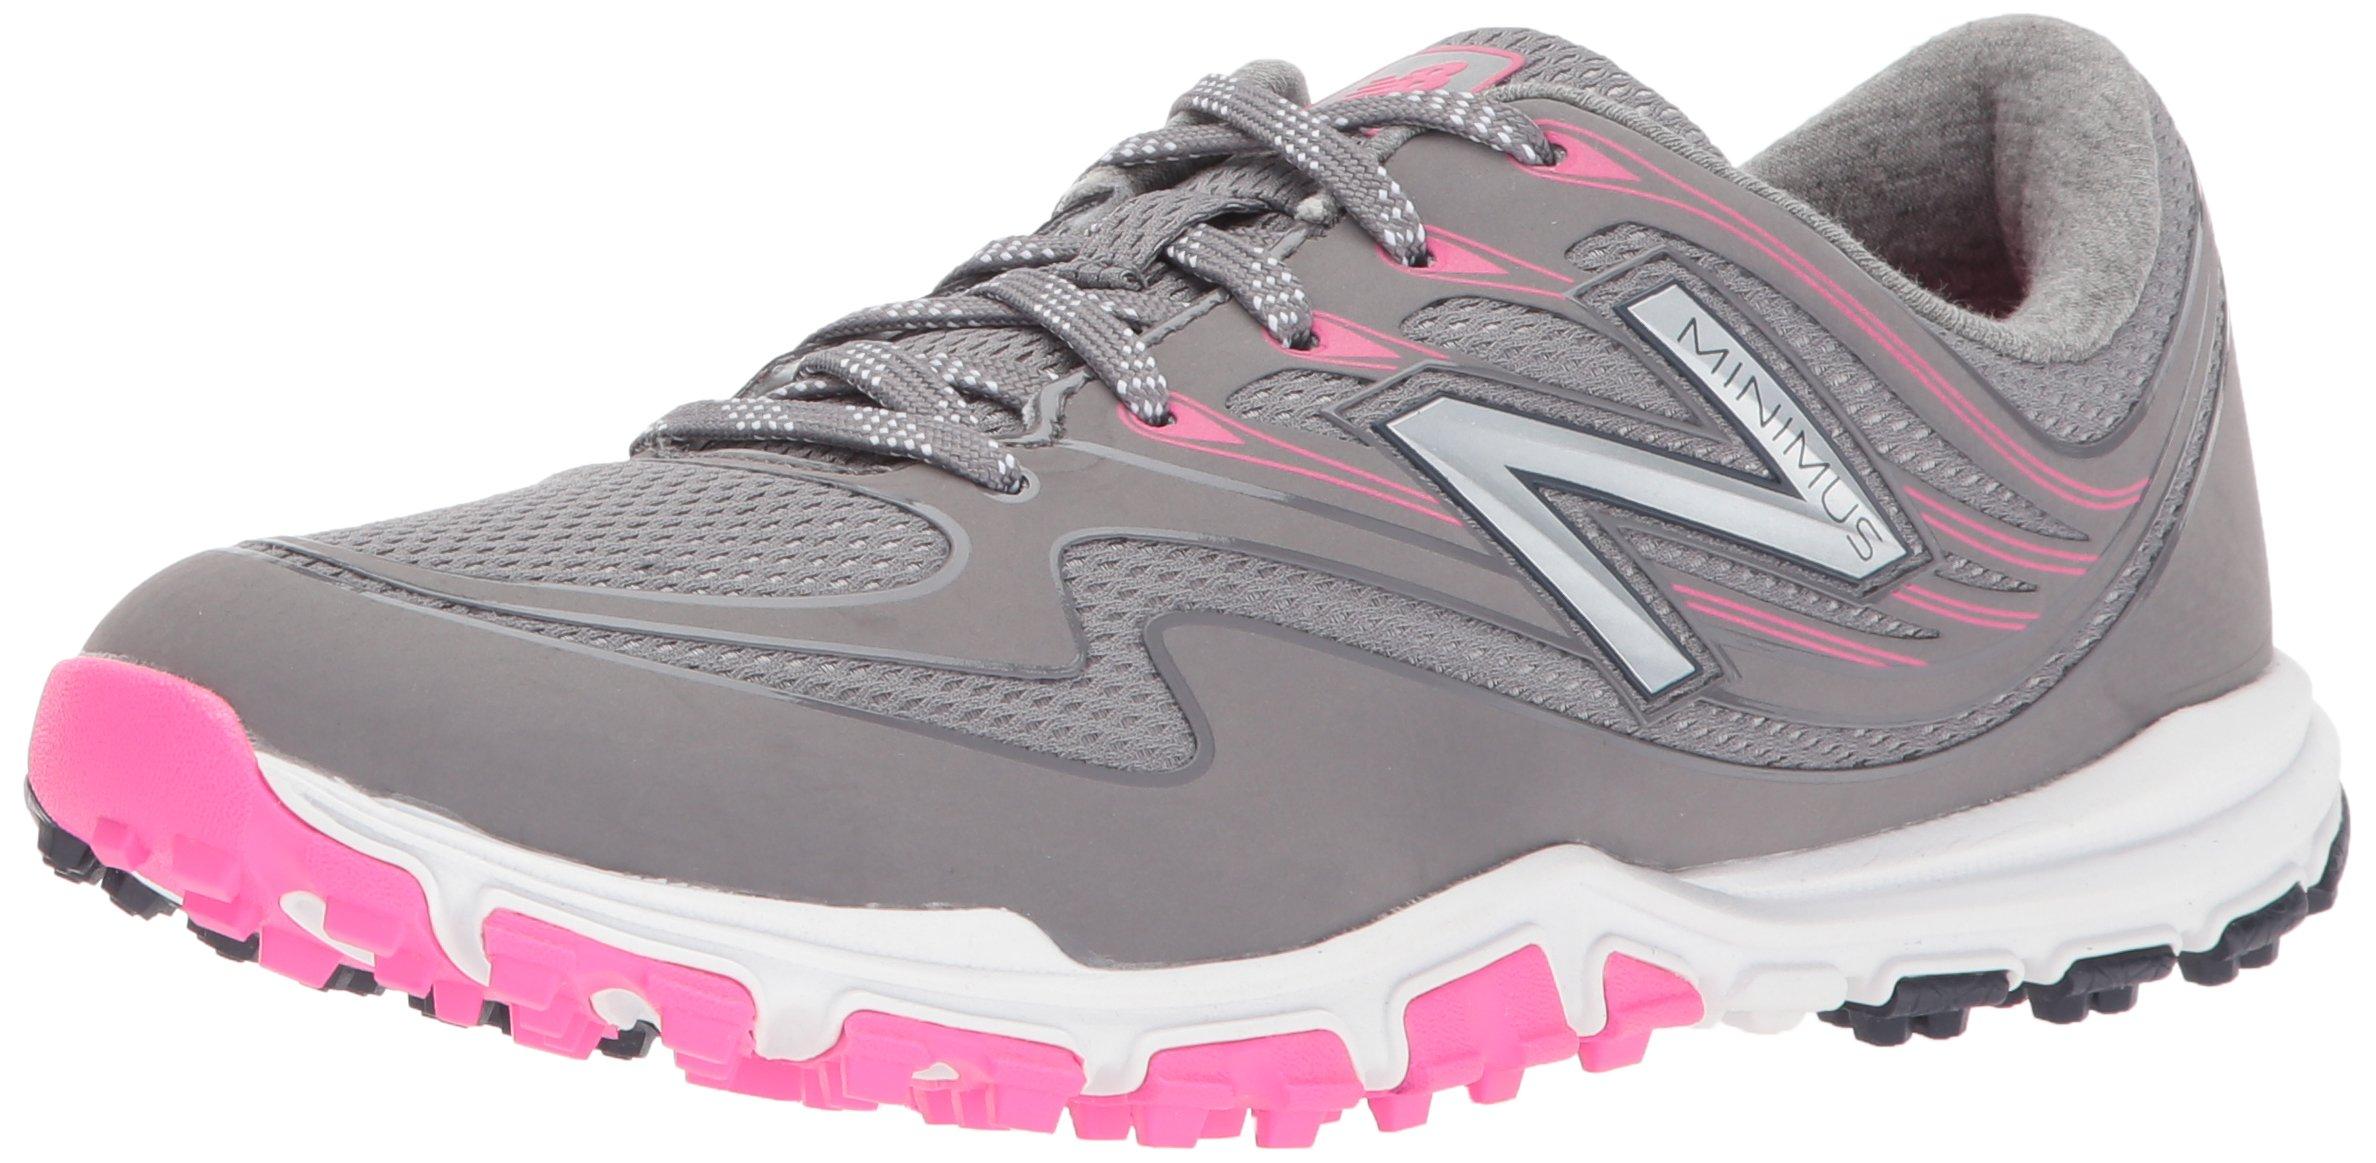 New Balance Women's Minimus Sport Golf Shoe, Pink/Grey, 7.5 B B US